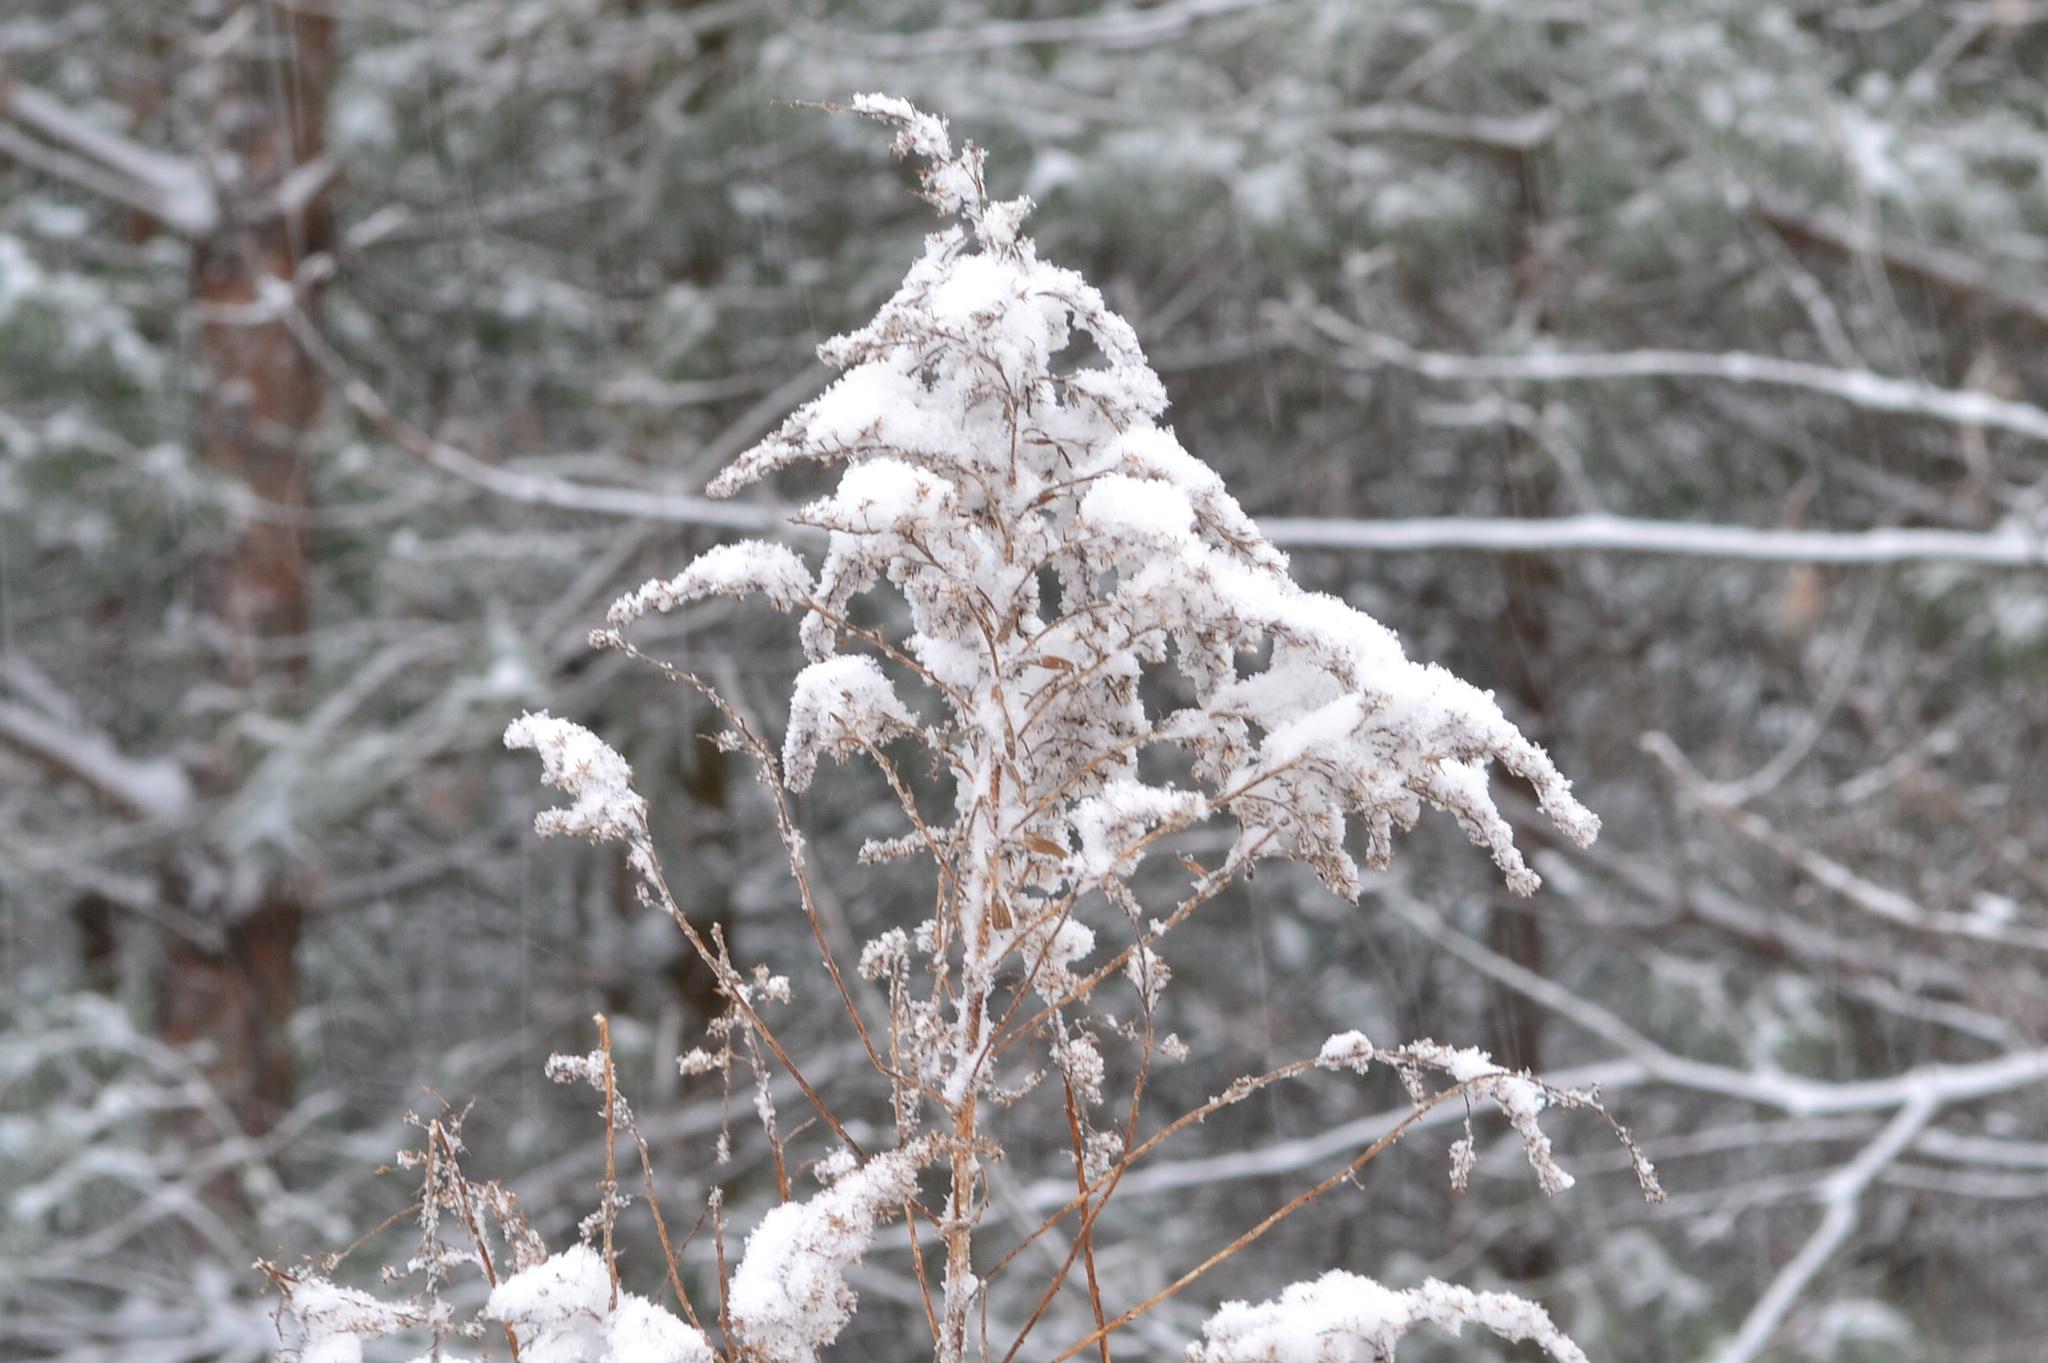 Winter weeds by Thom FitzRandolph